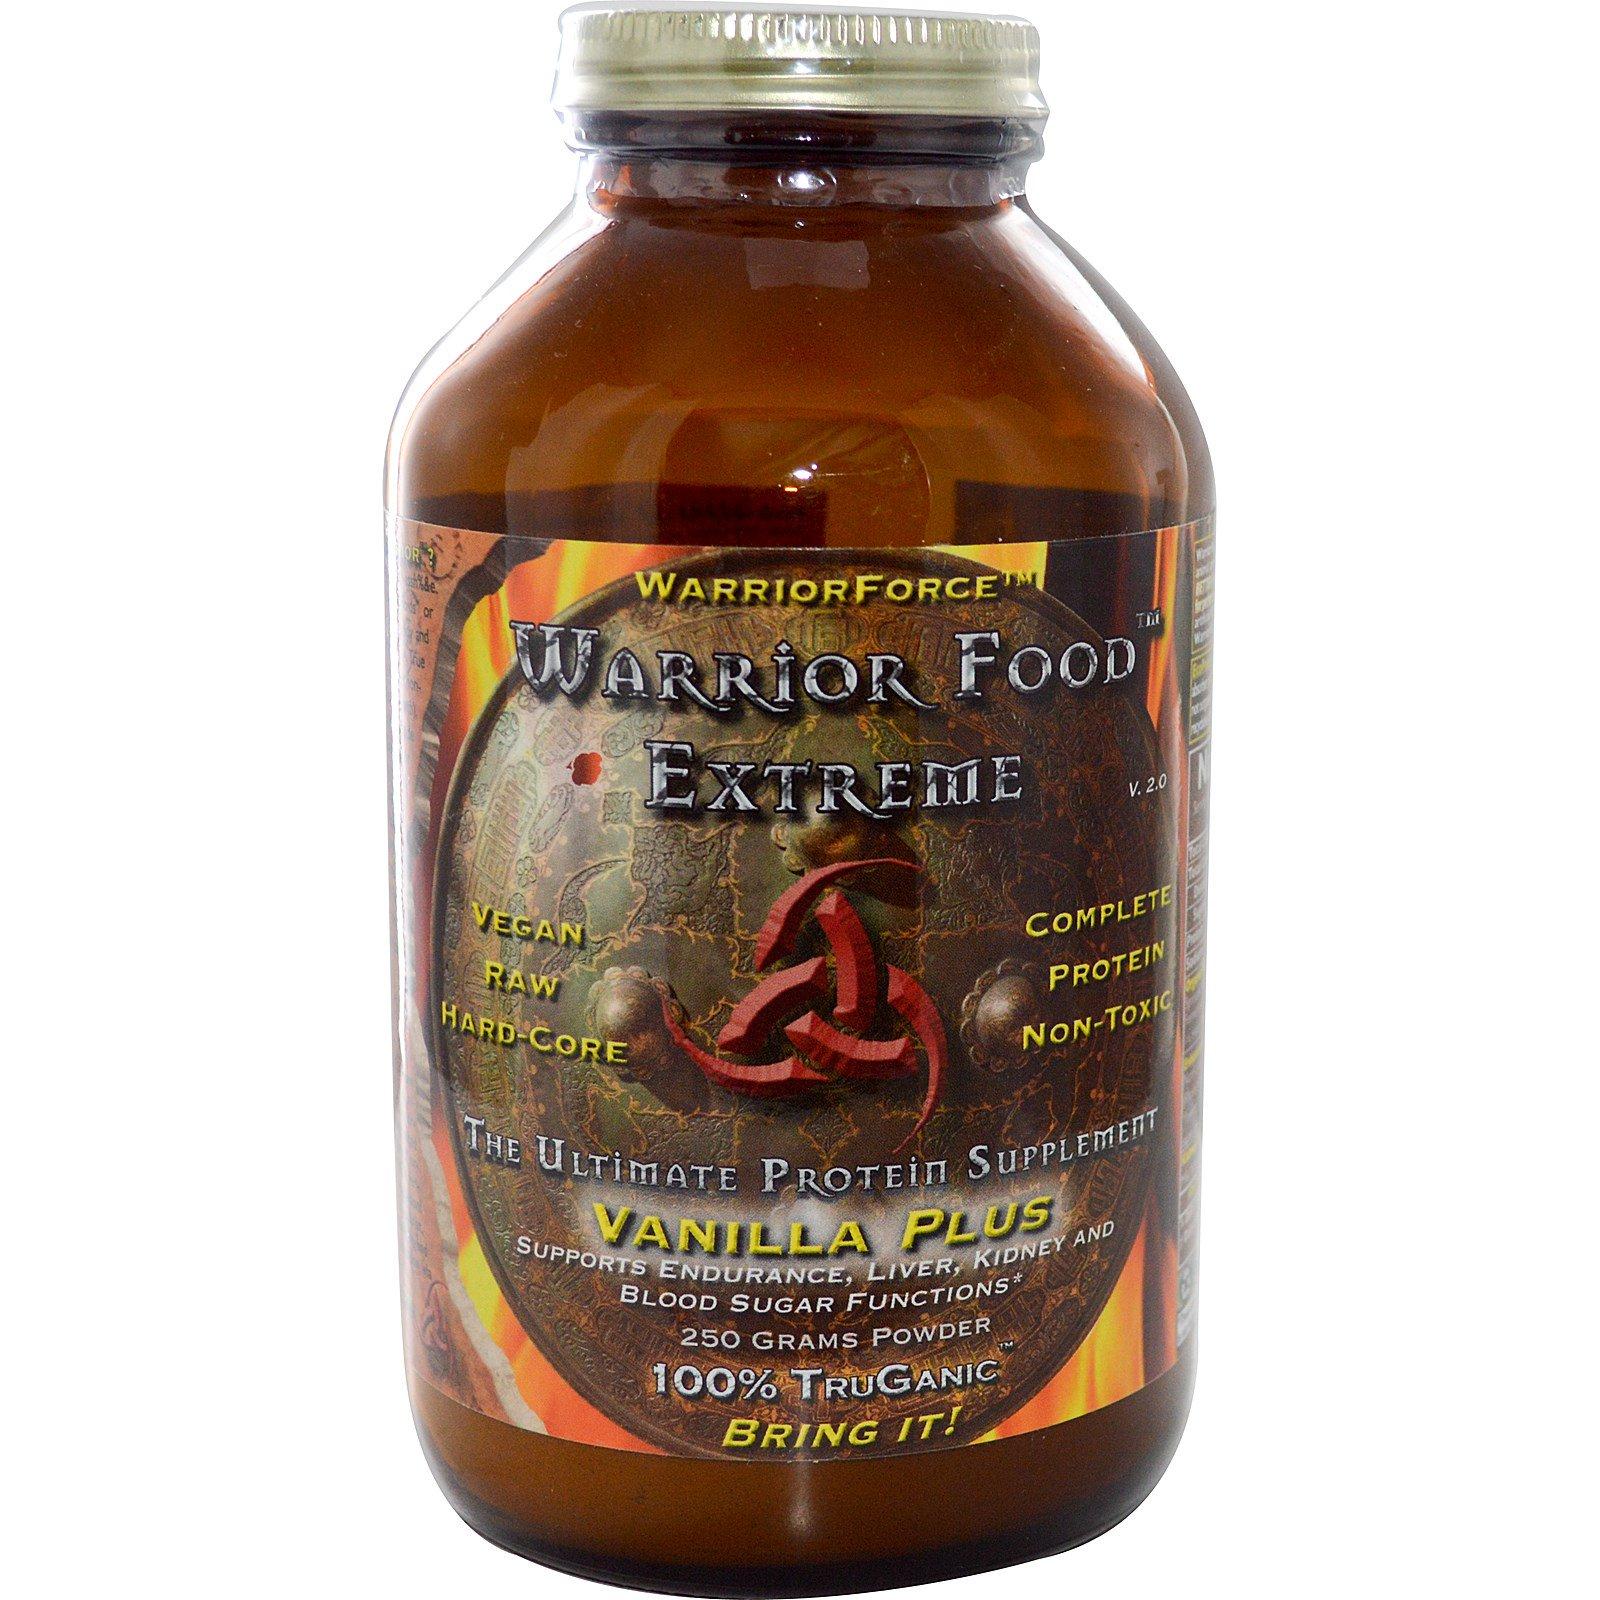 HealthForce Superfoods, Warrior Food Extreme, V 2 0, The